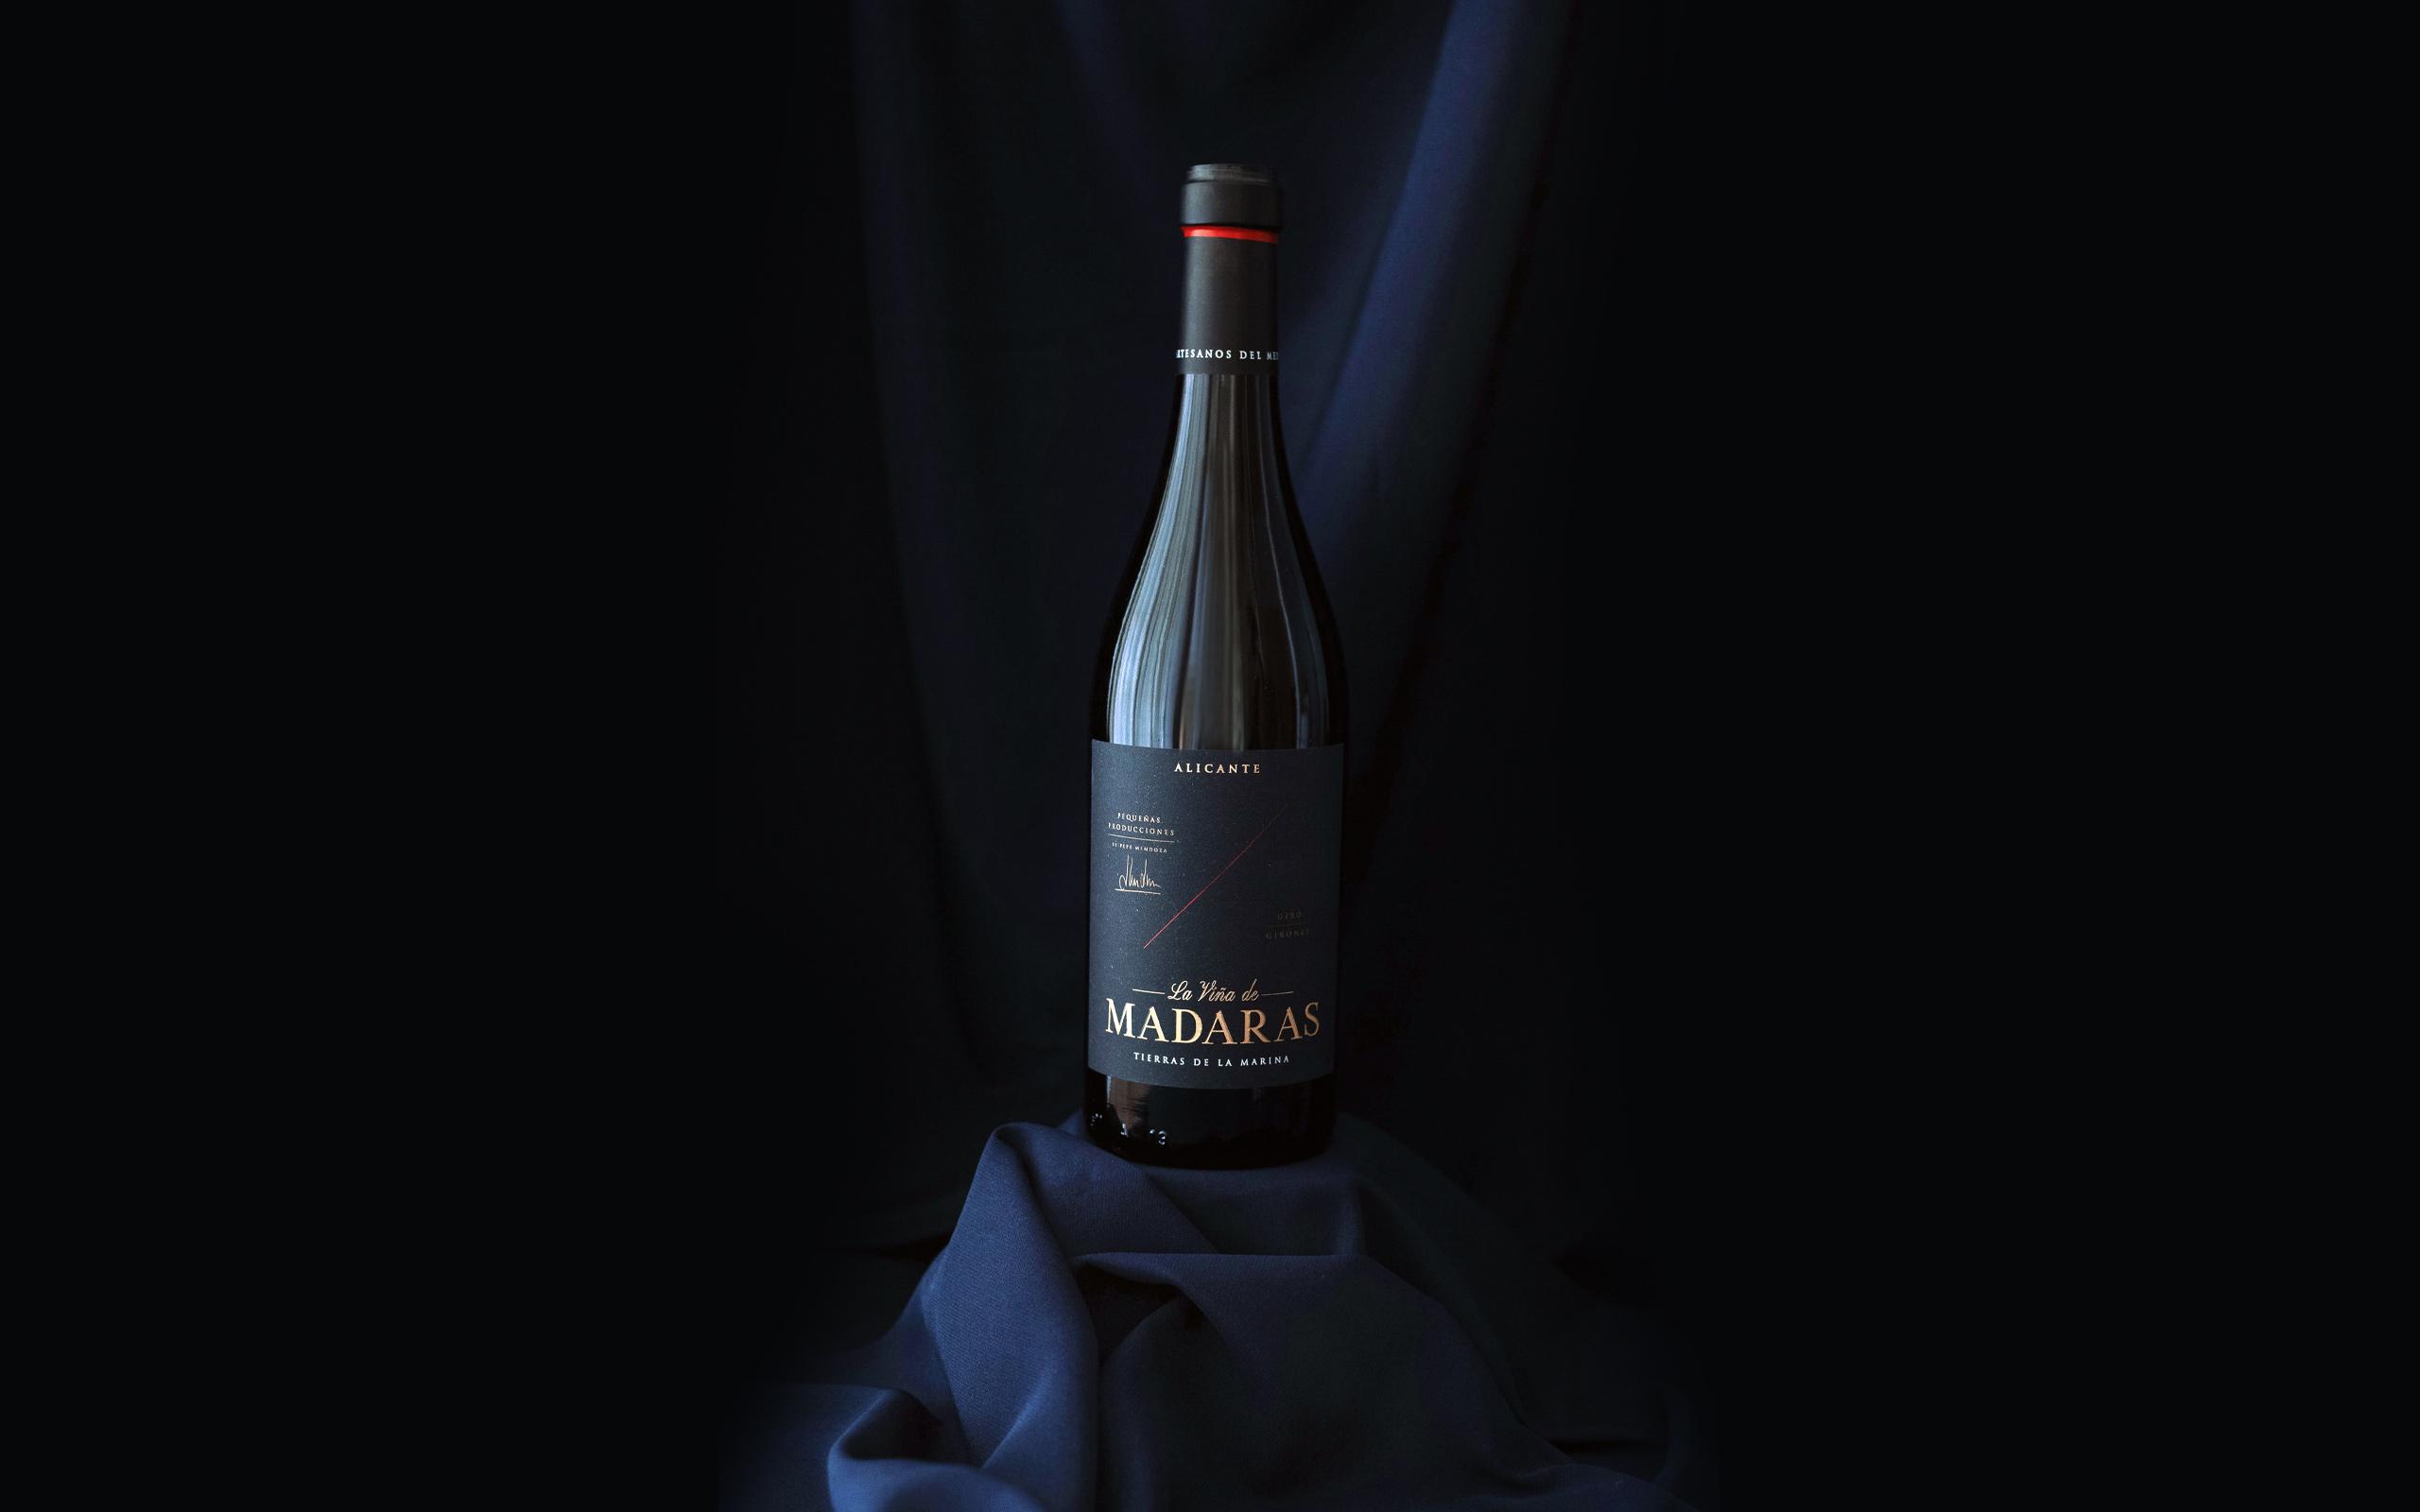 Madaras Packaging Labelling Design – Created by Evangelisti y Cía